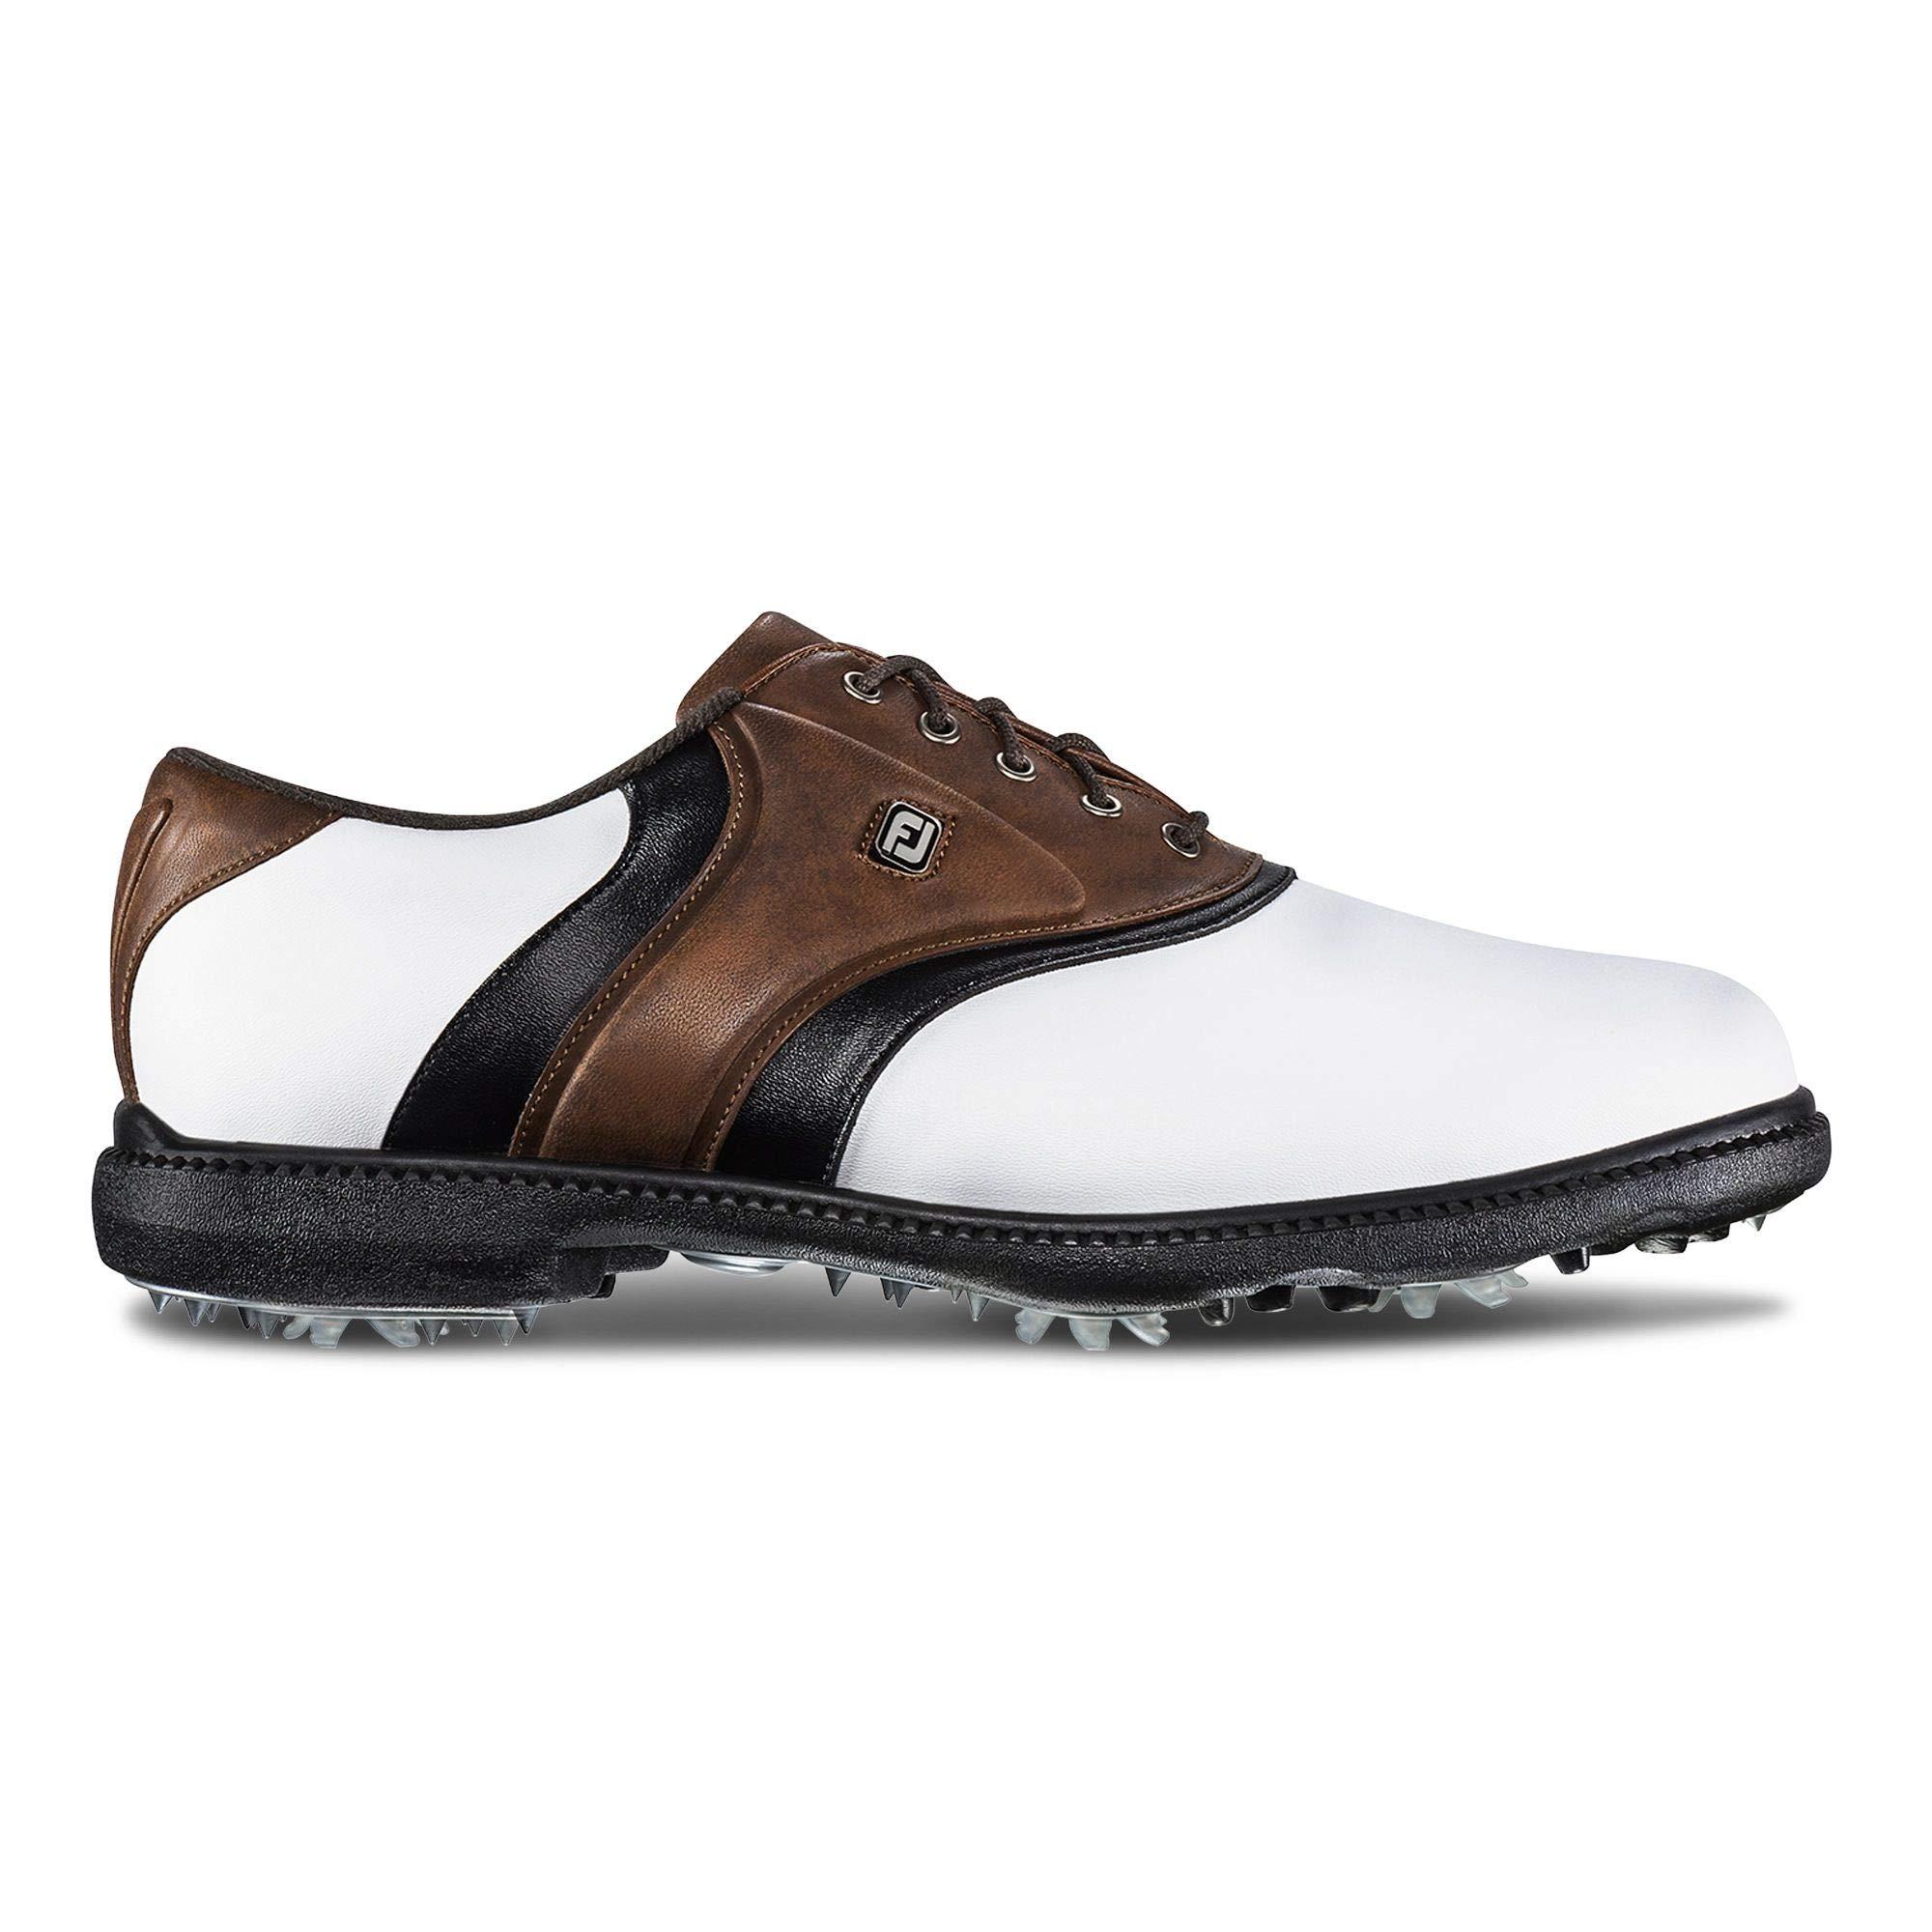 FootJoy Men's Originals Golf Shoes White 10 M Brown, US by FootJoy